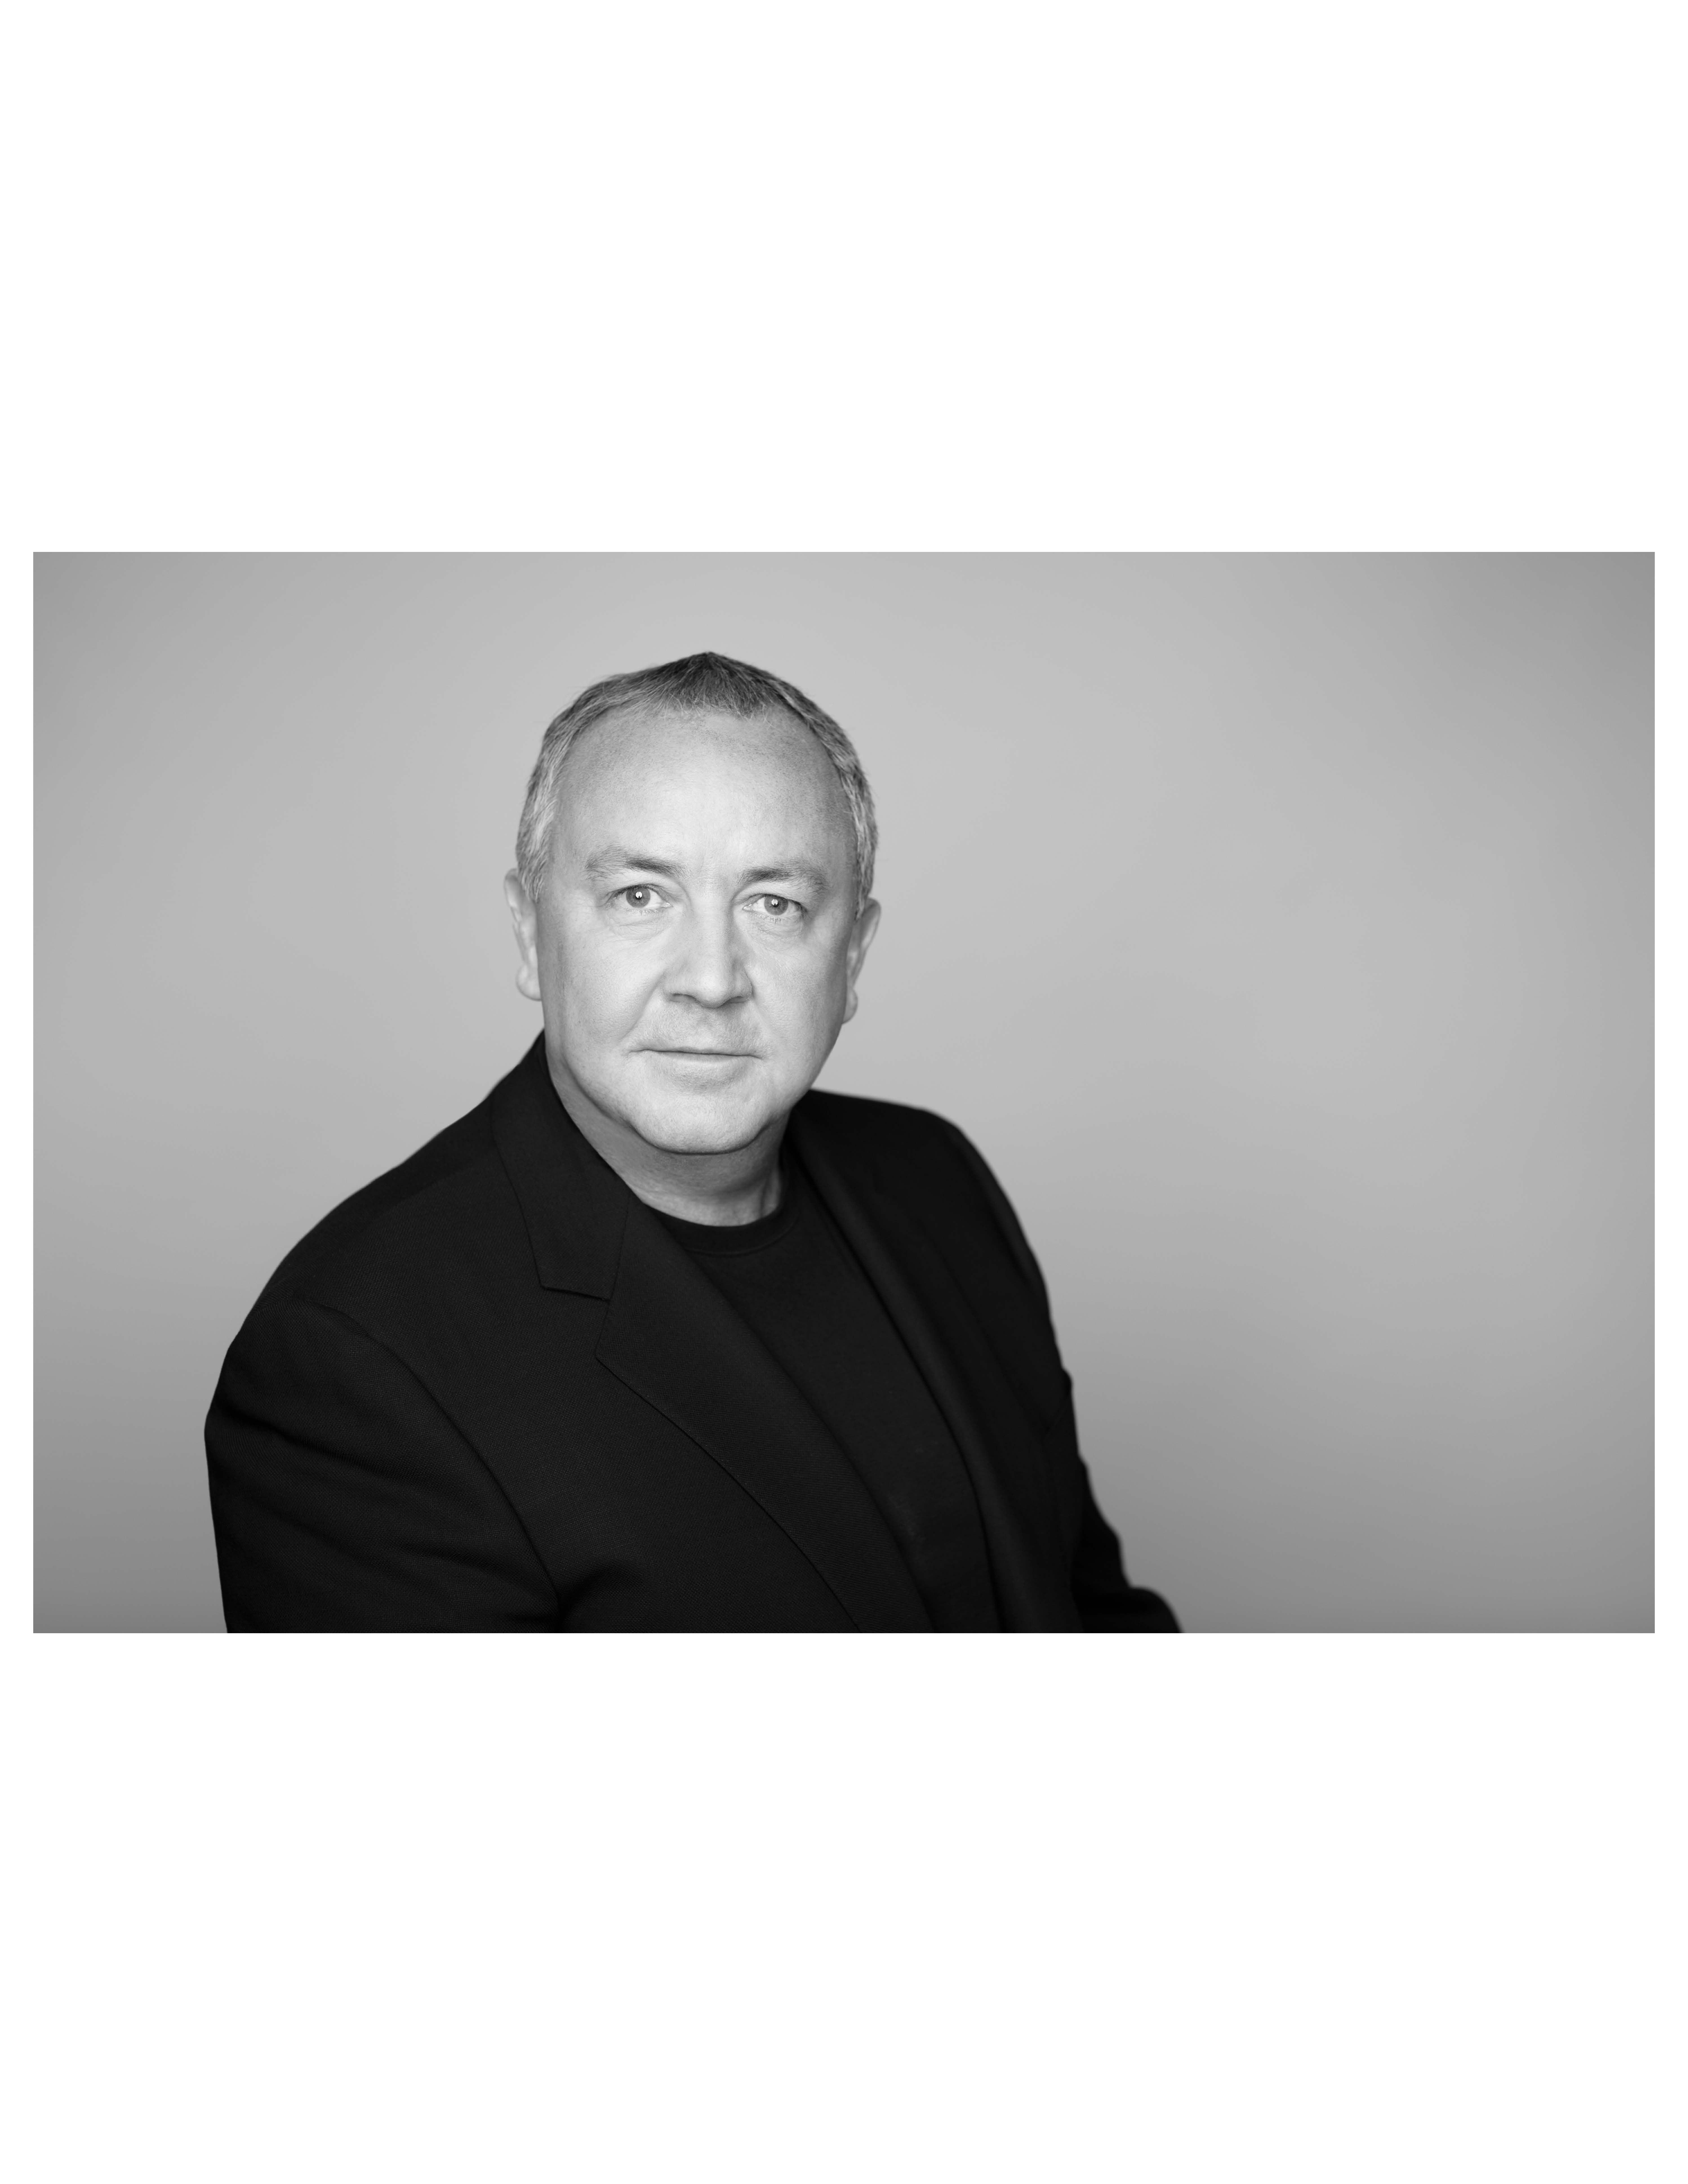 Global Chief Creative Officer, Leo Burnett Worldwide